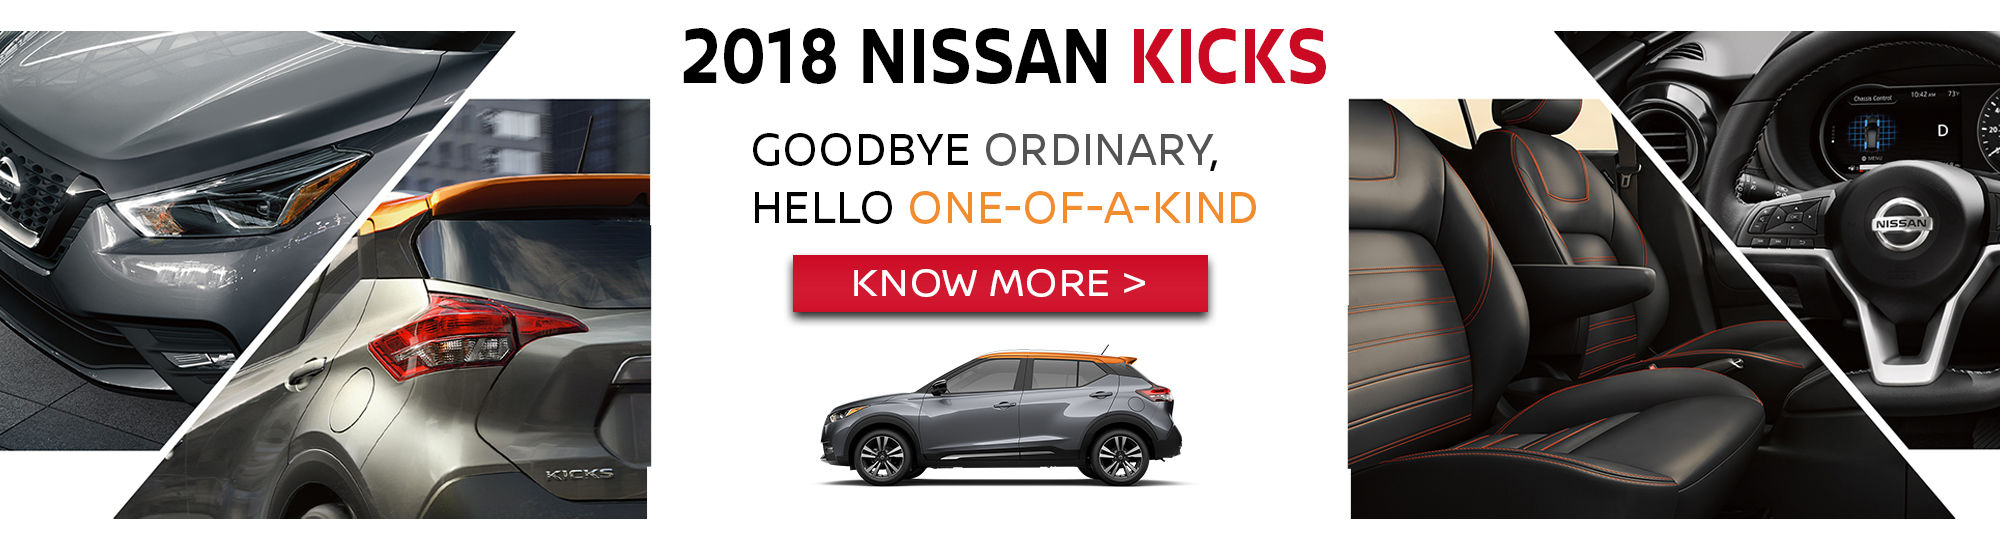 2018 kicks